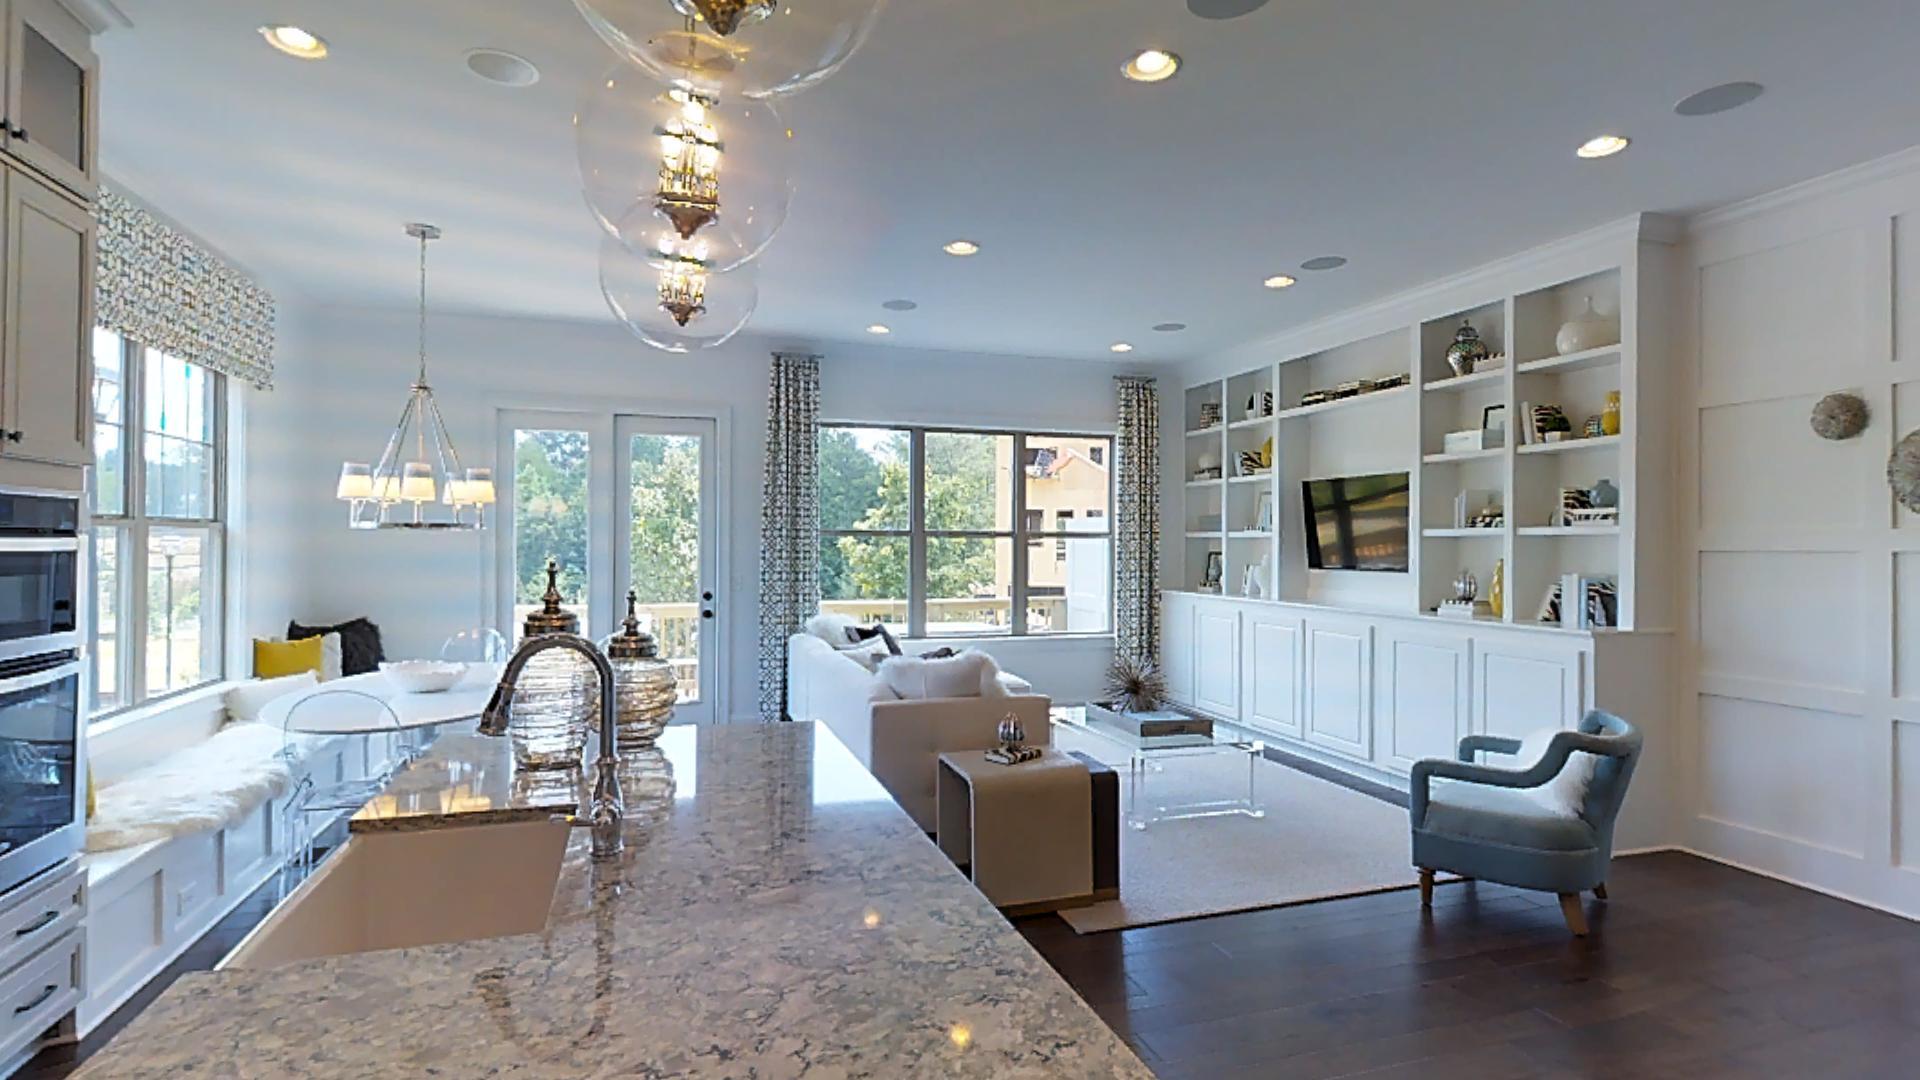 edward andrews homes harlow albany designer model - Home Model Pictures